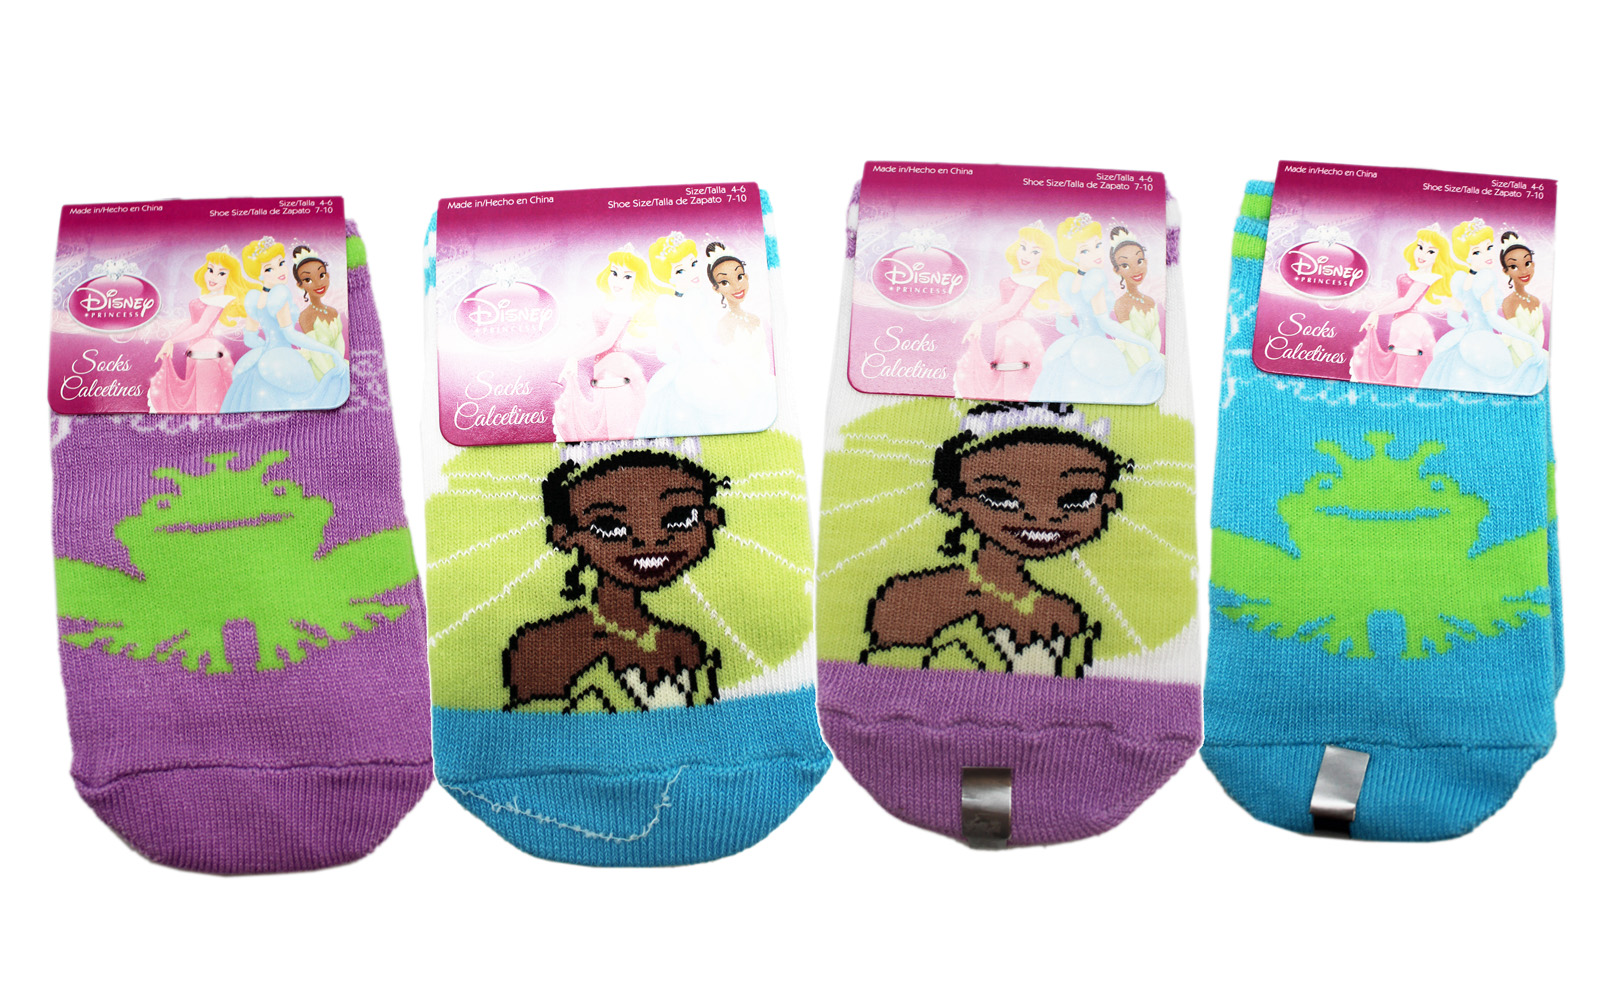 3 Pair Assorted Disney Princess Socks Kids Socks Size 4-6